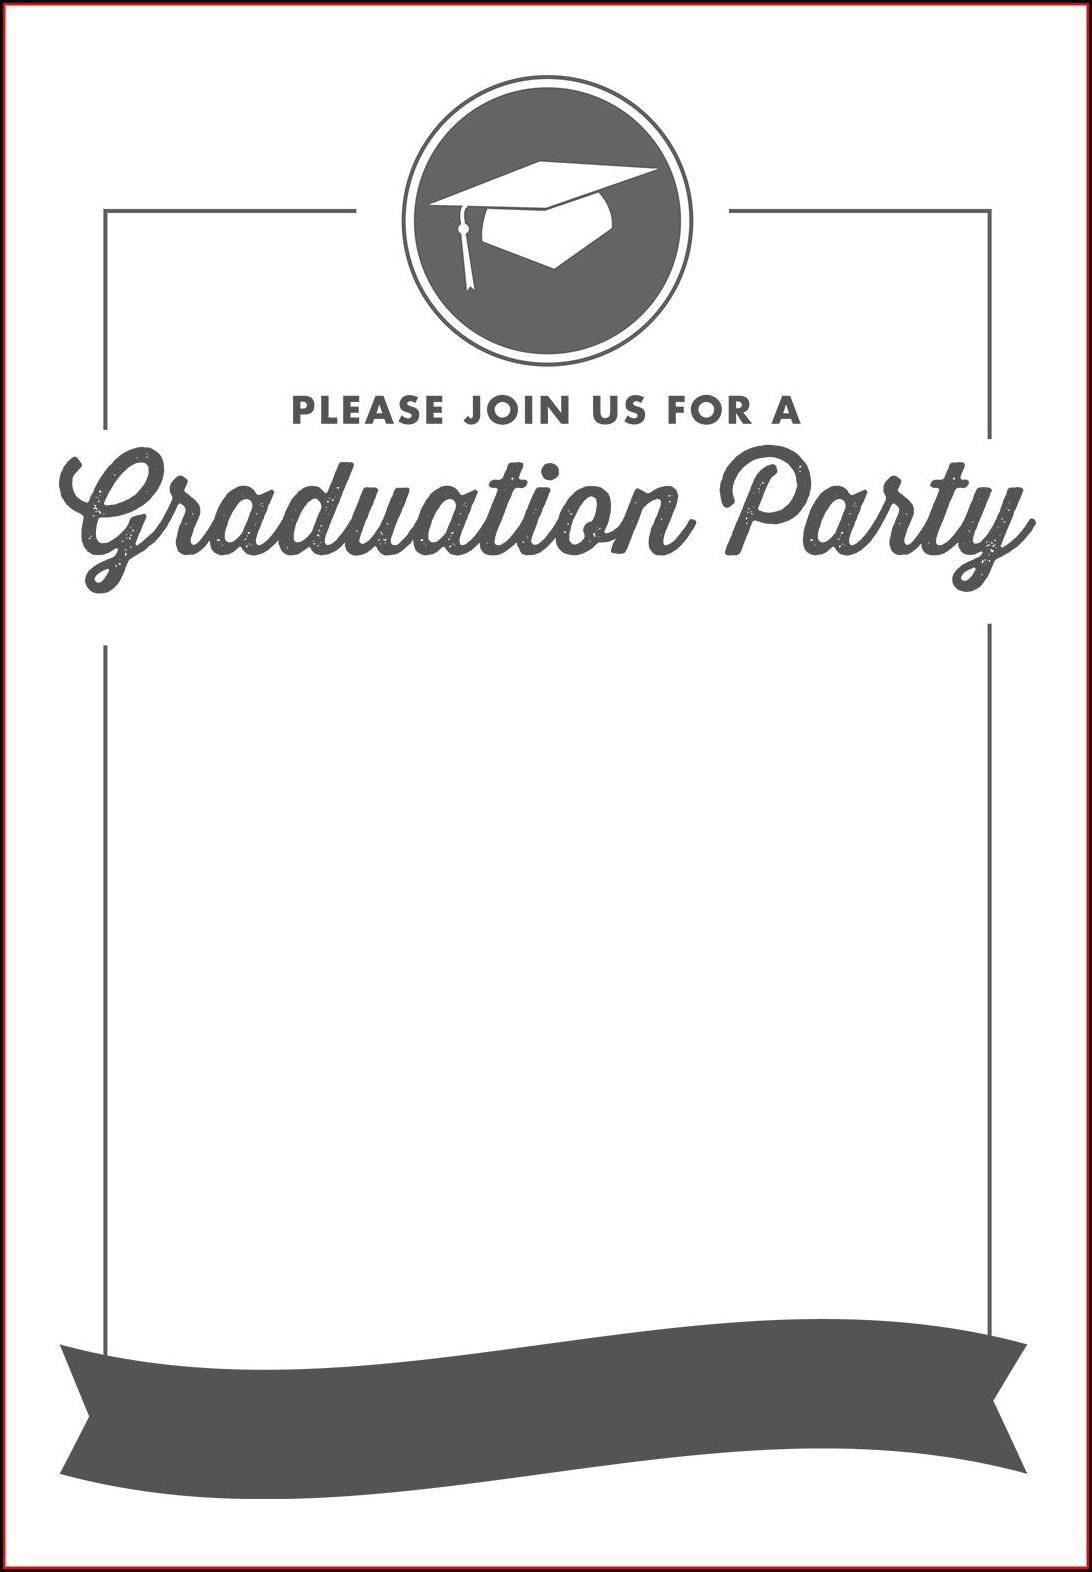 Graduation Party Invitations Template Free